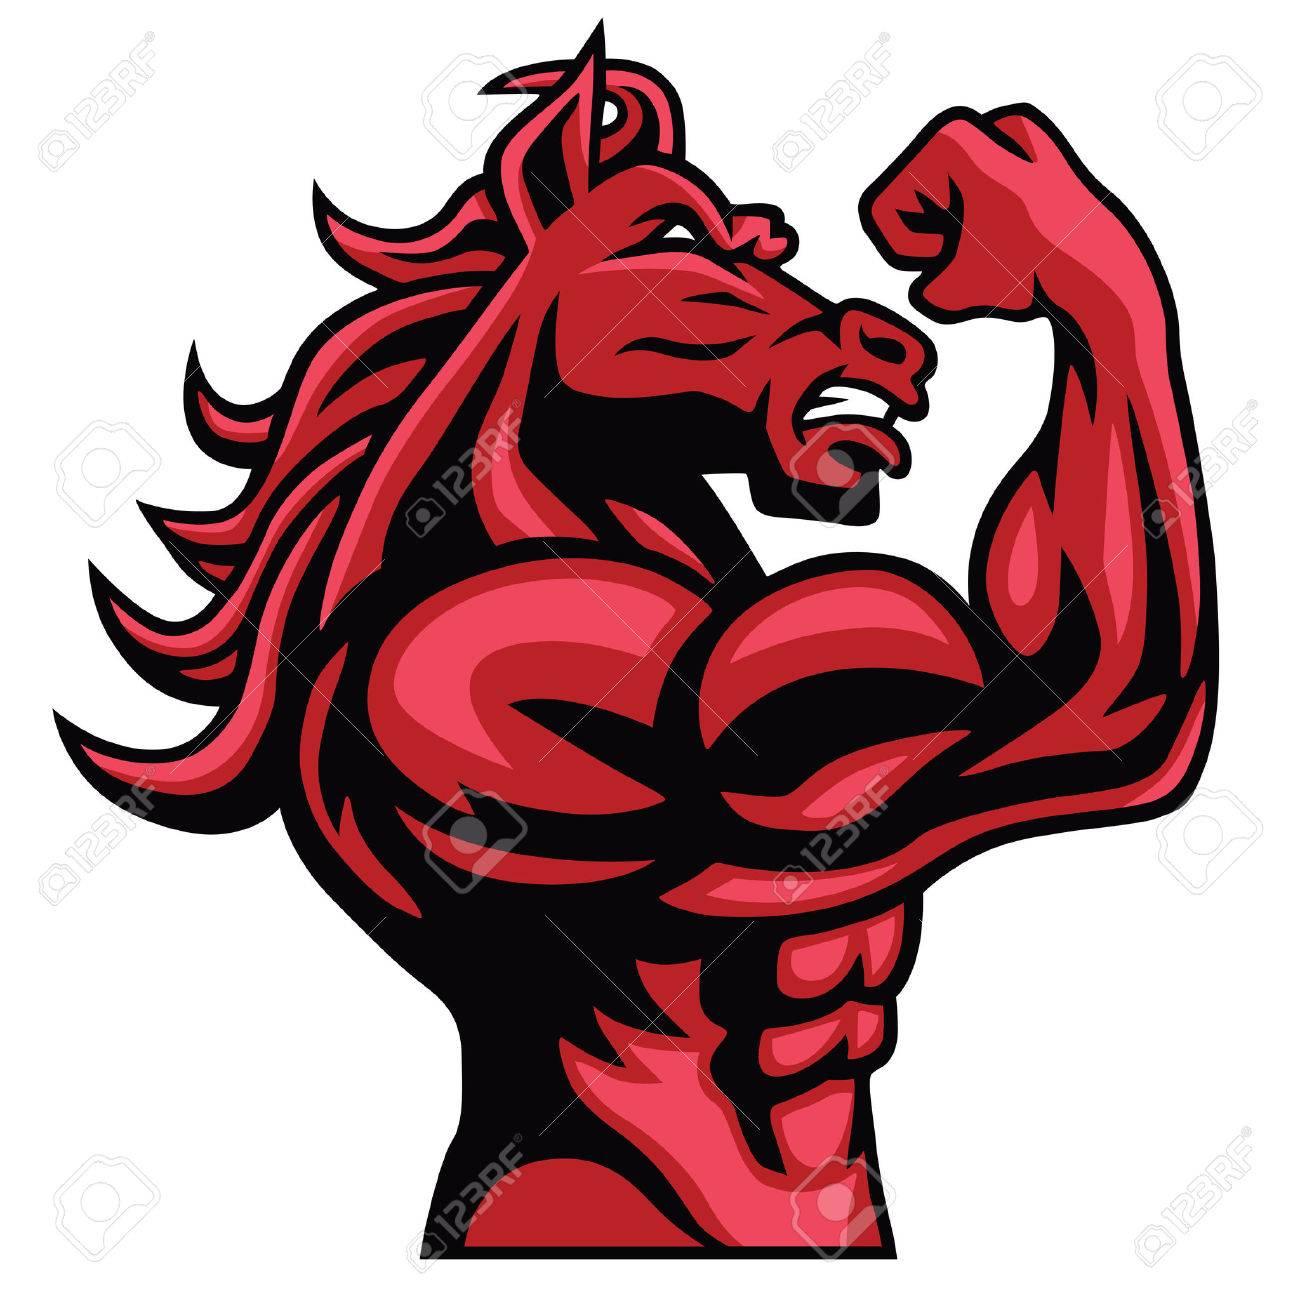 Red Horse Bodybuilder Posing His Muscular Body - 62619977